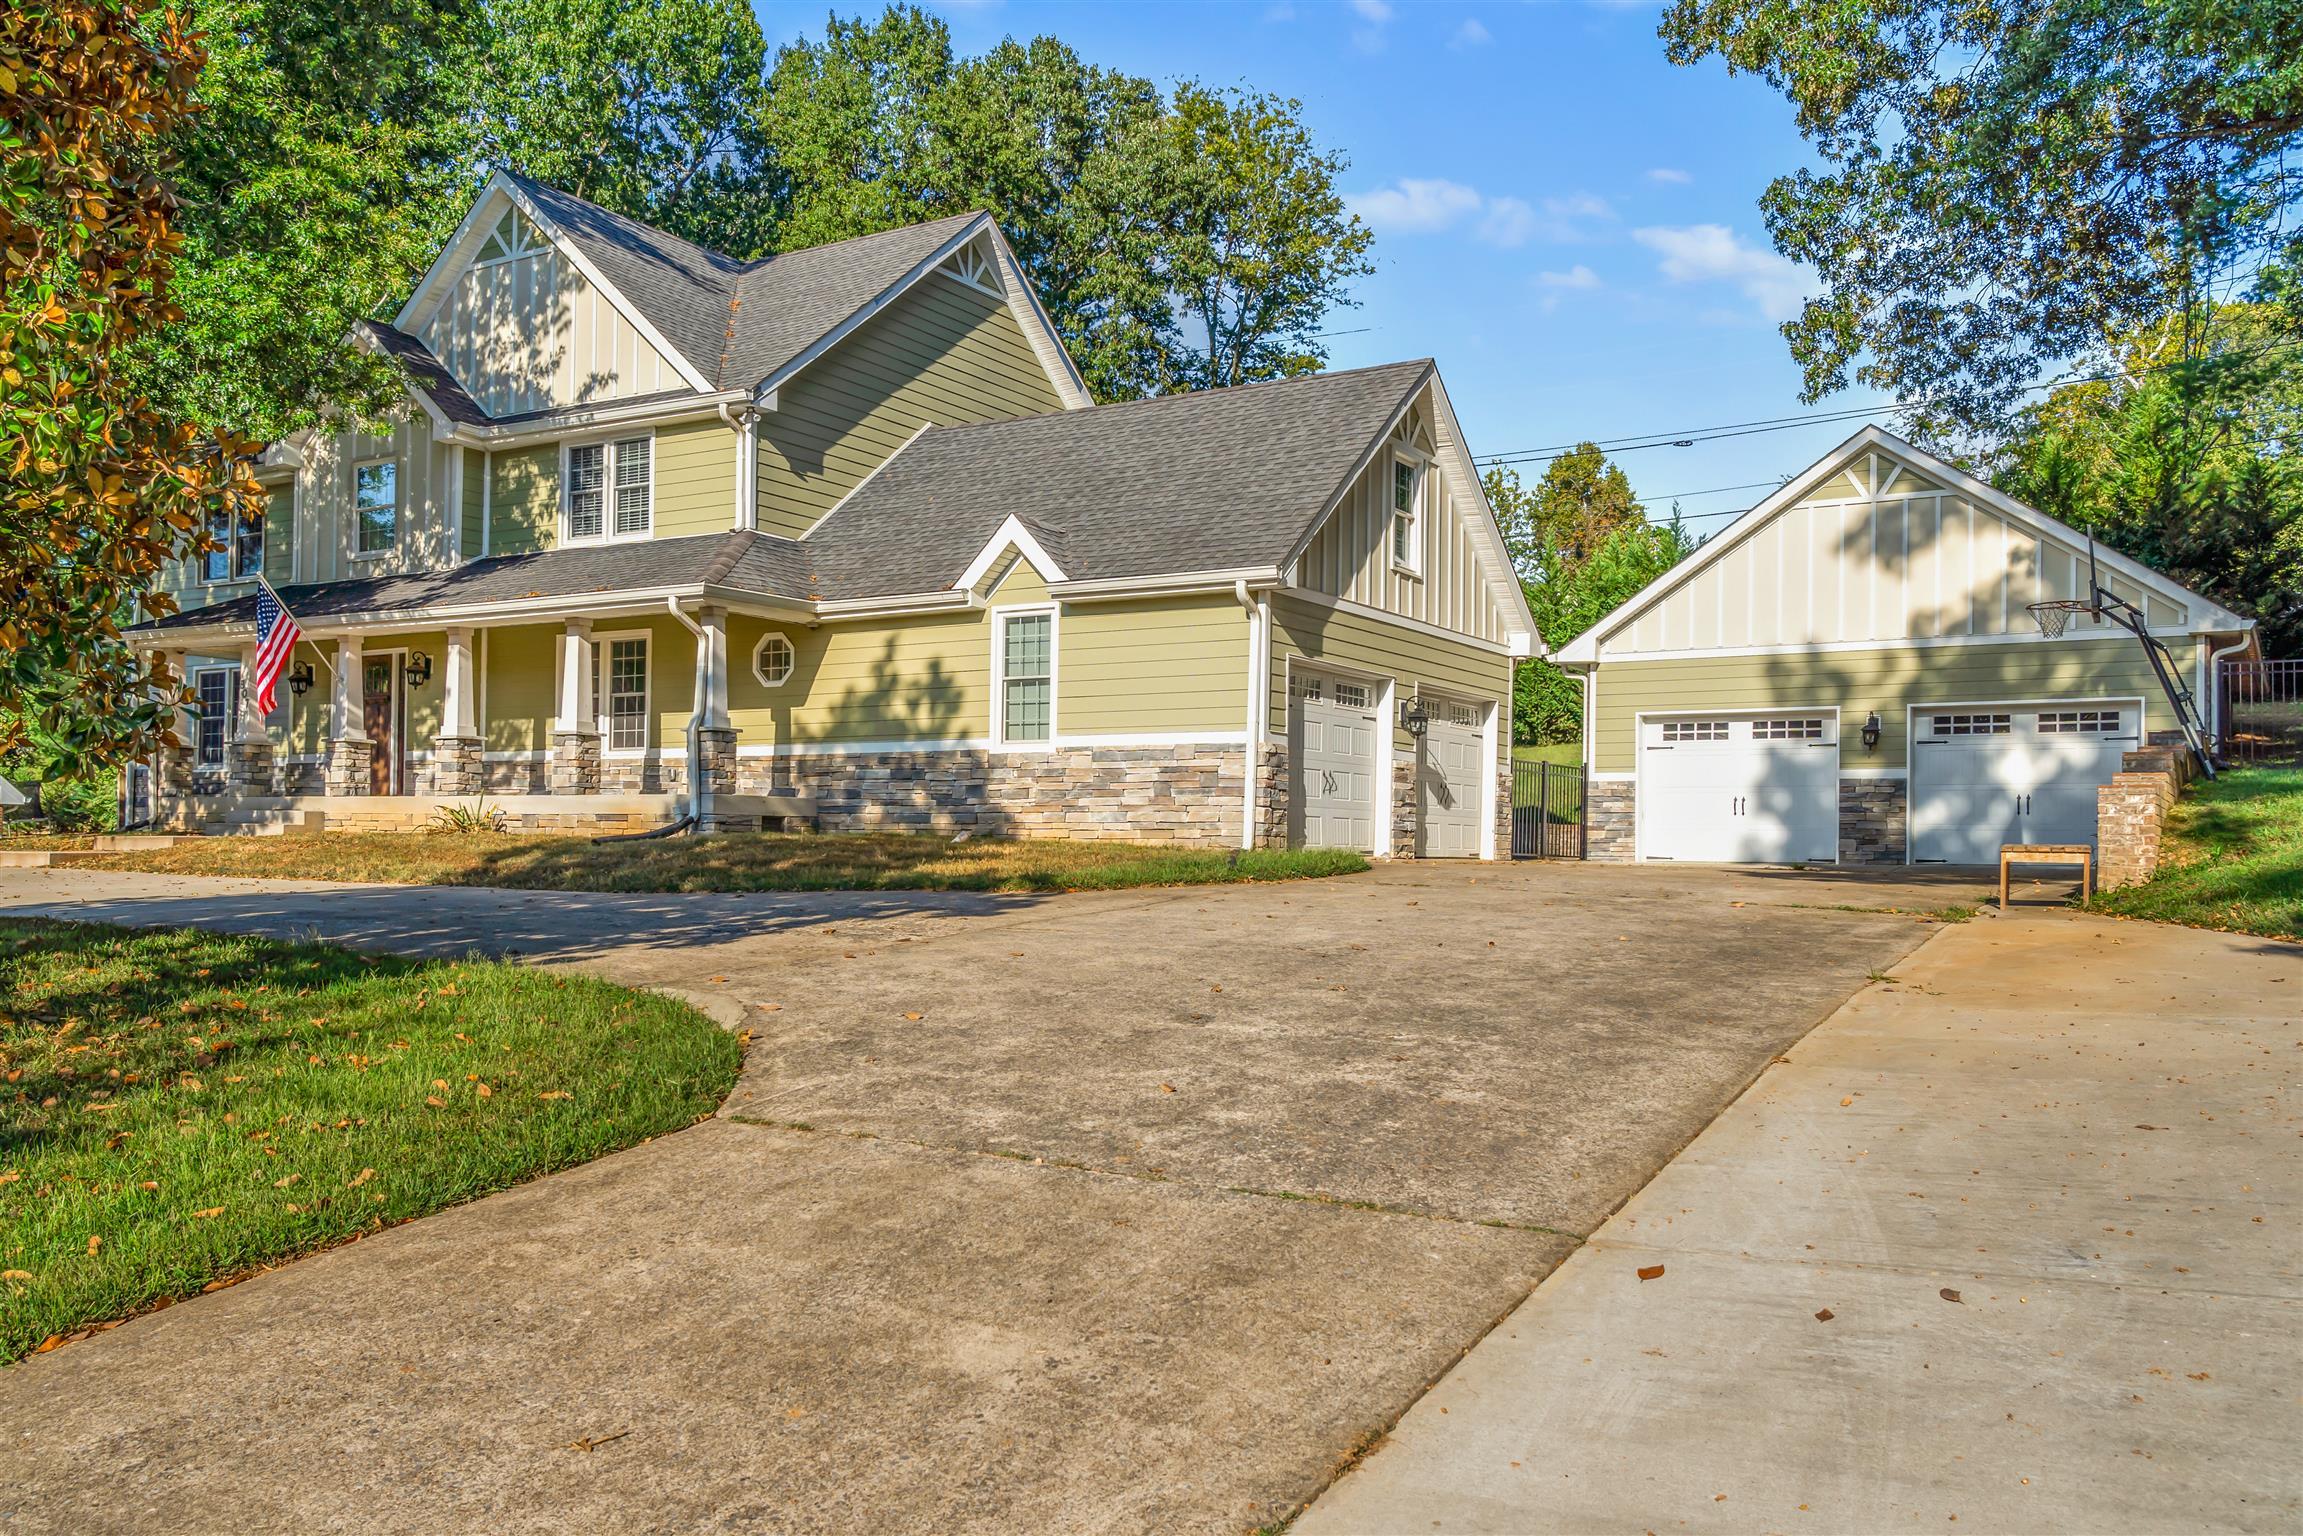 807 River Run, Clarksville, TN 37043 - Clarksville, TN real estate listing